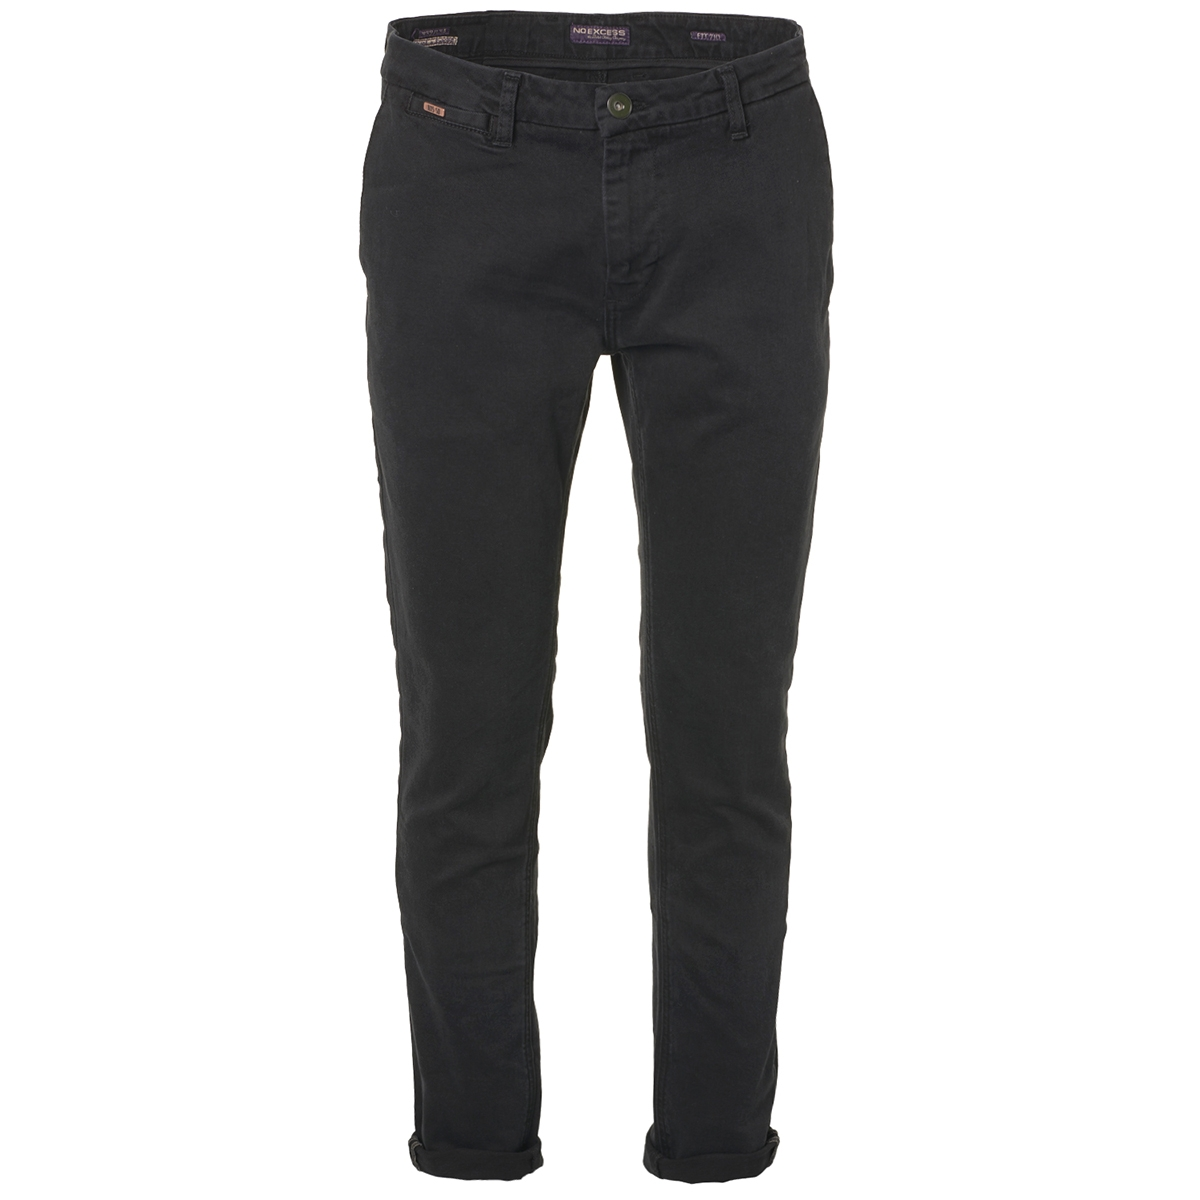 710 super slim fit 92710d63 no-excess jeans 223 black denim